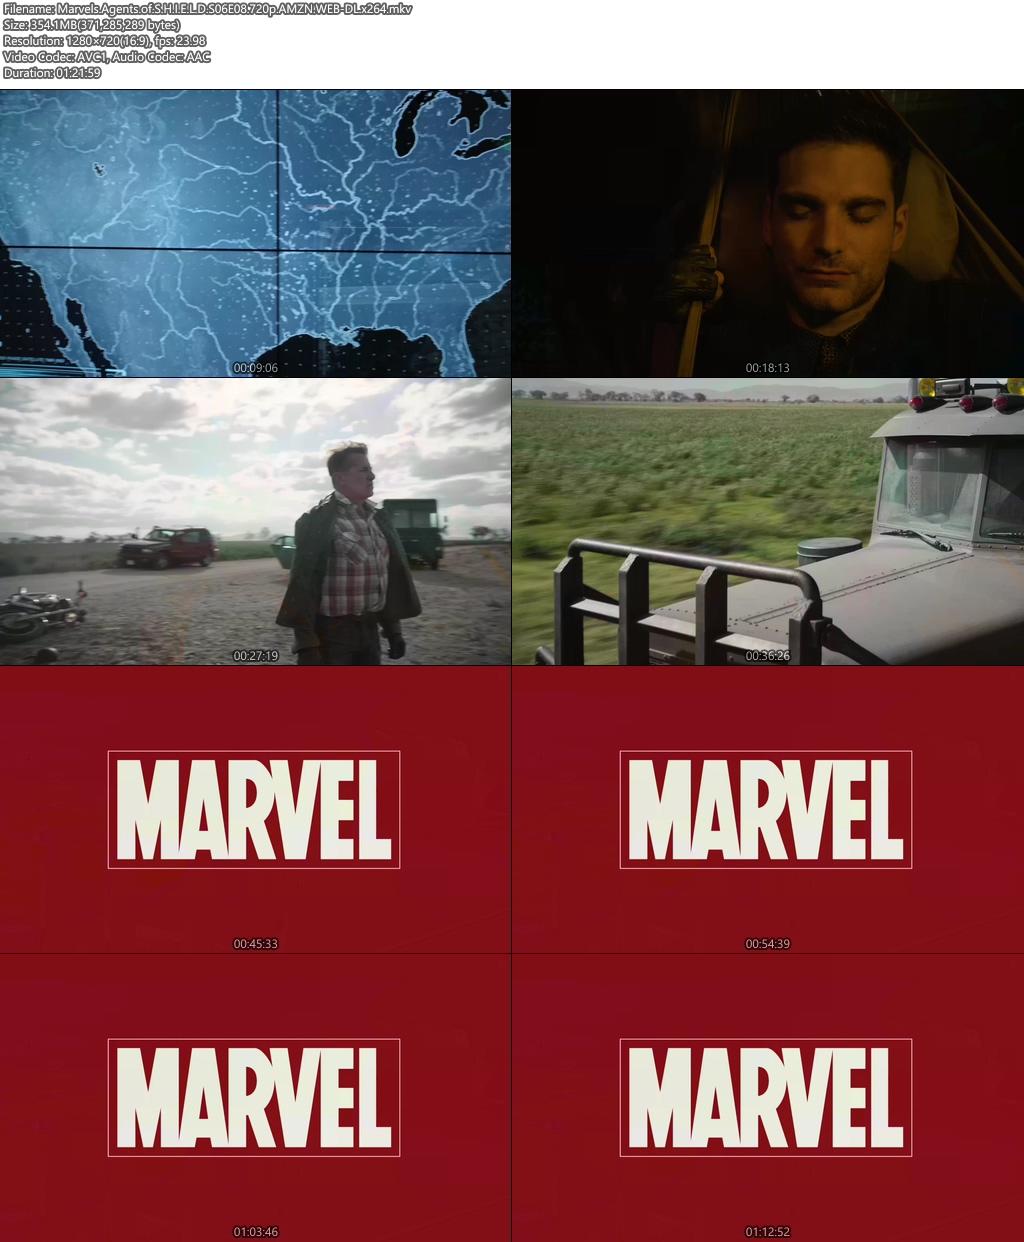 Marvels Agents of S.H.I.E.L.D S06E08 720p AMZN WEB-DL x264 Screenshot